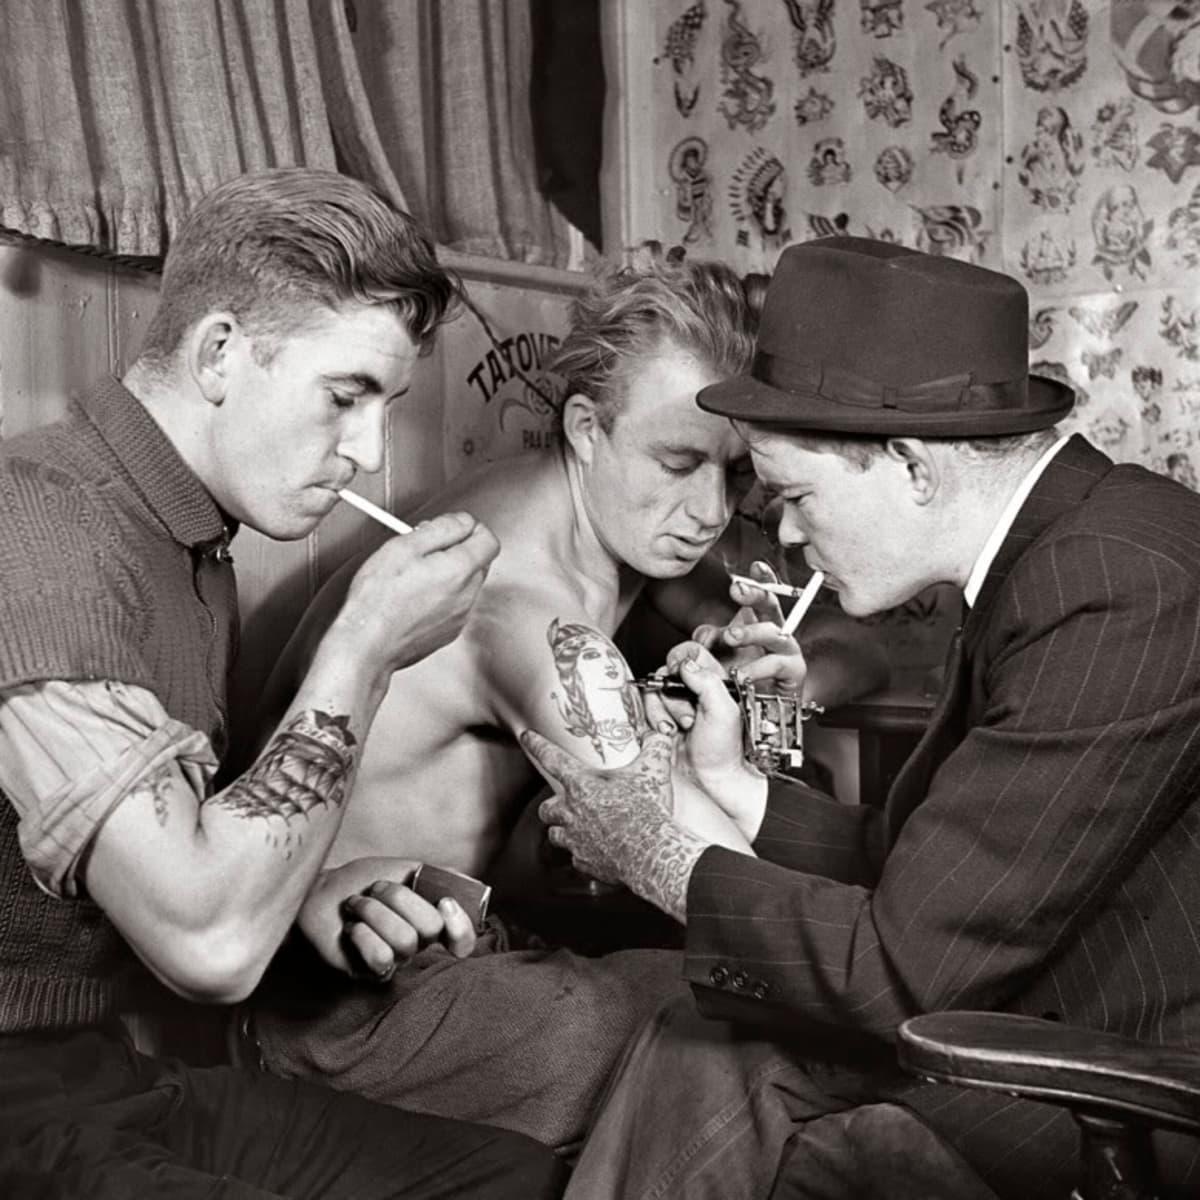 Traditional Nautical Sailor Tattoos Meanings Origins Ideas Tatring Tattoos Piercings